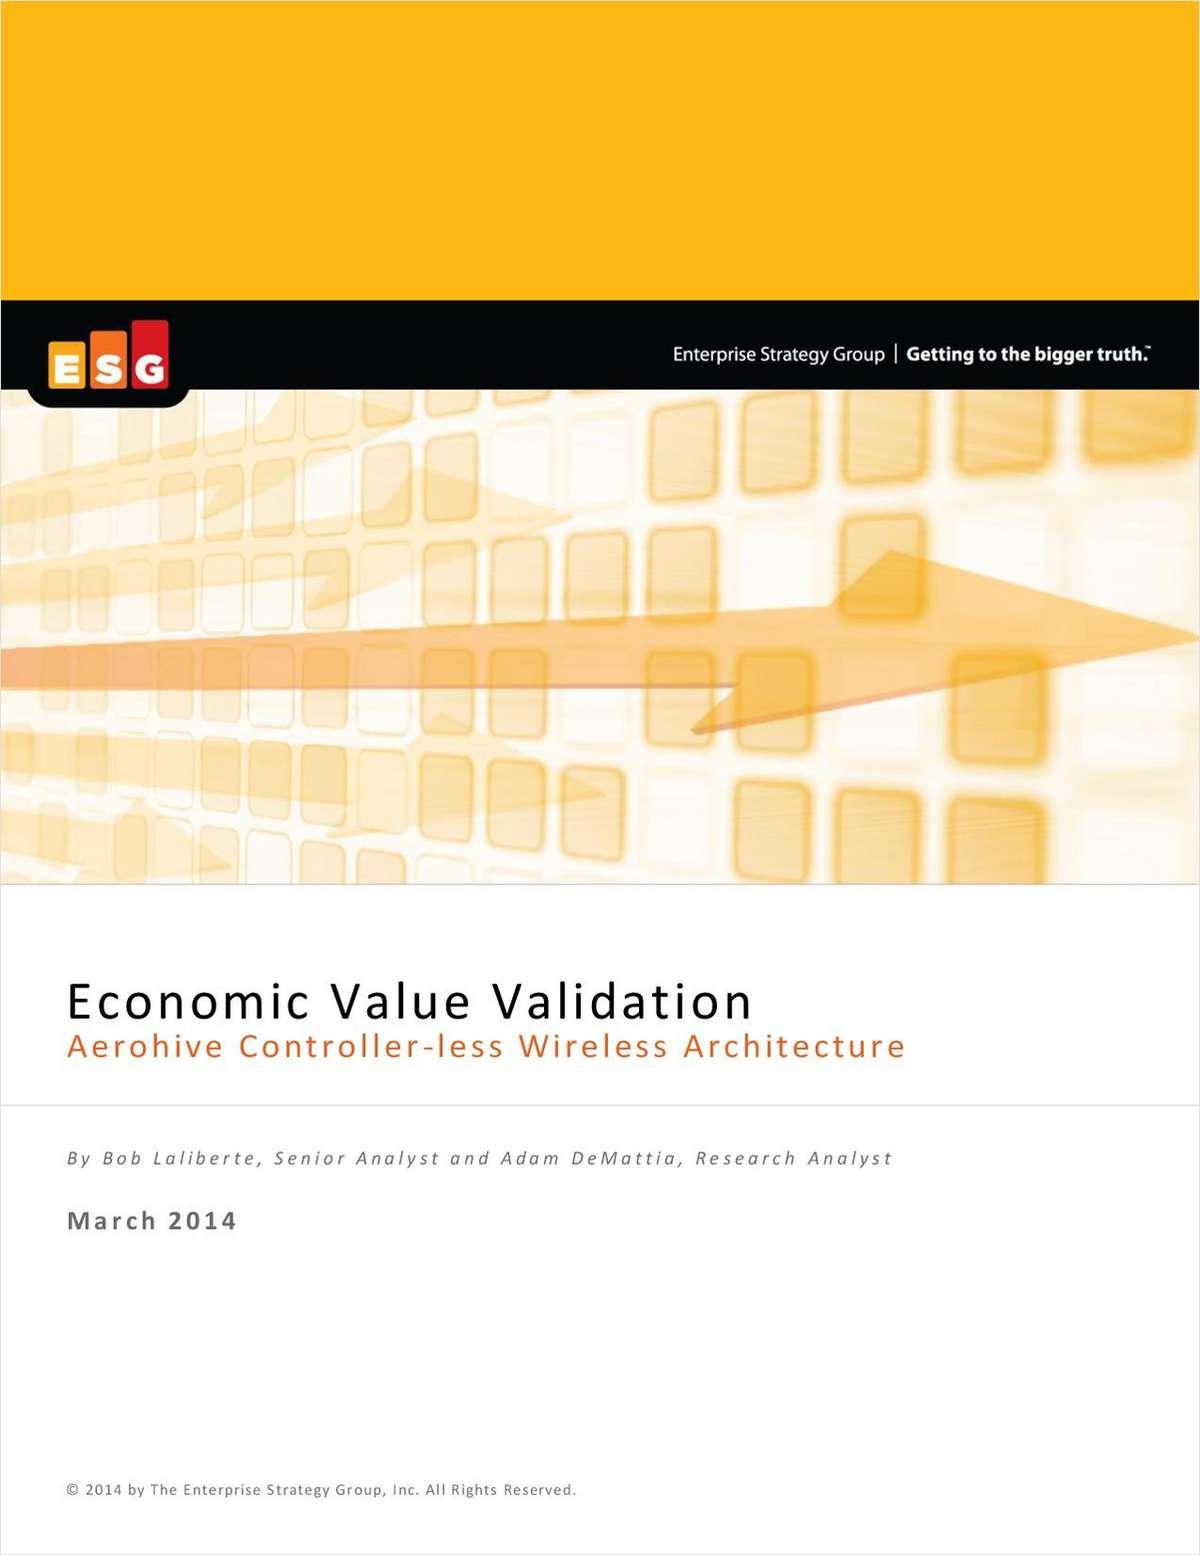 Economic Value Validation; Aerohive Controller-less Wireless Architecture